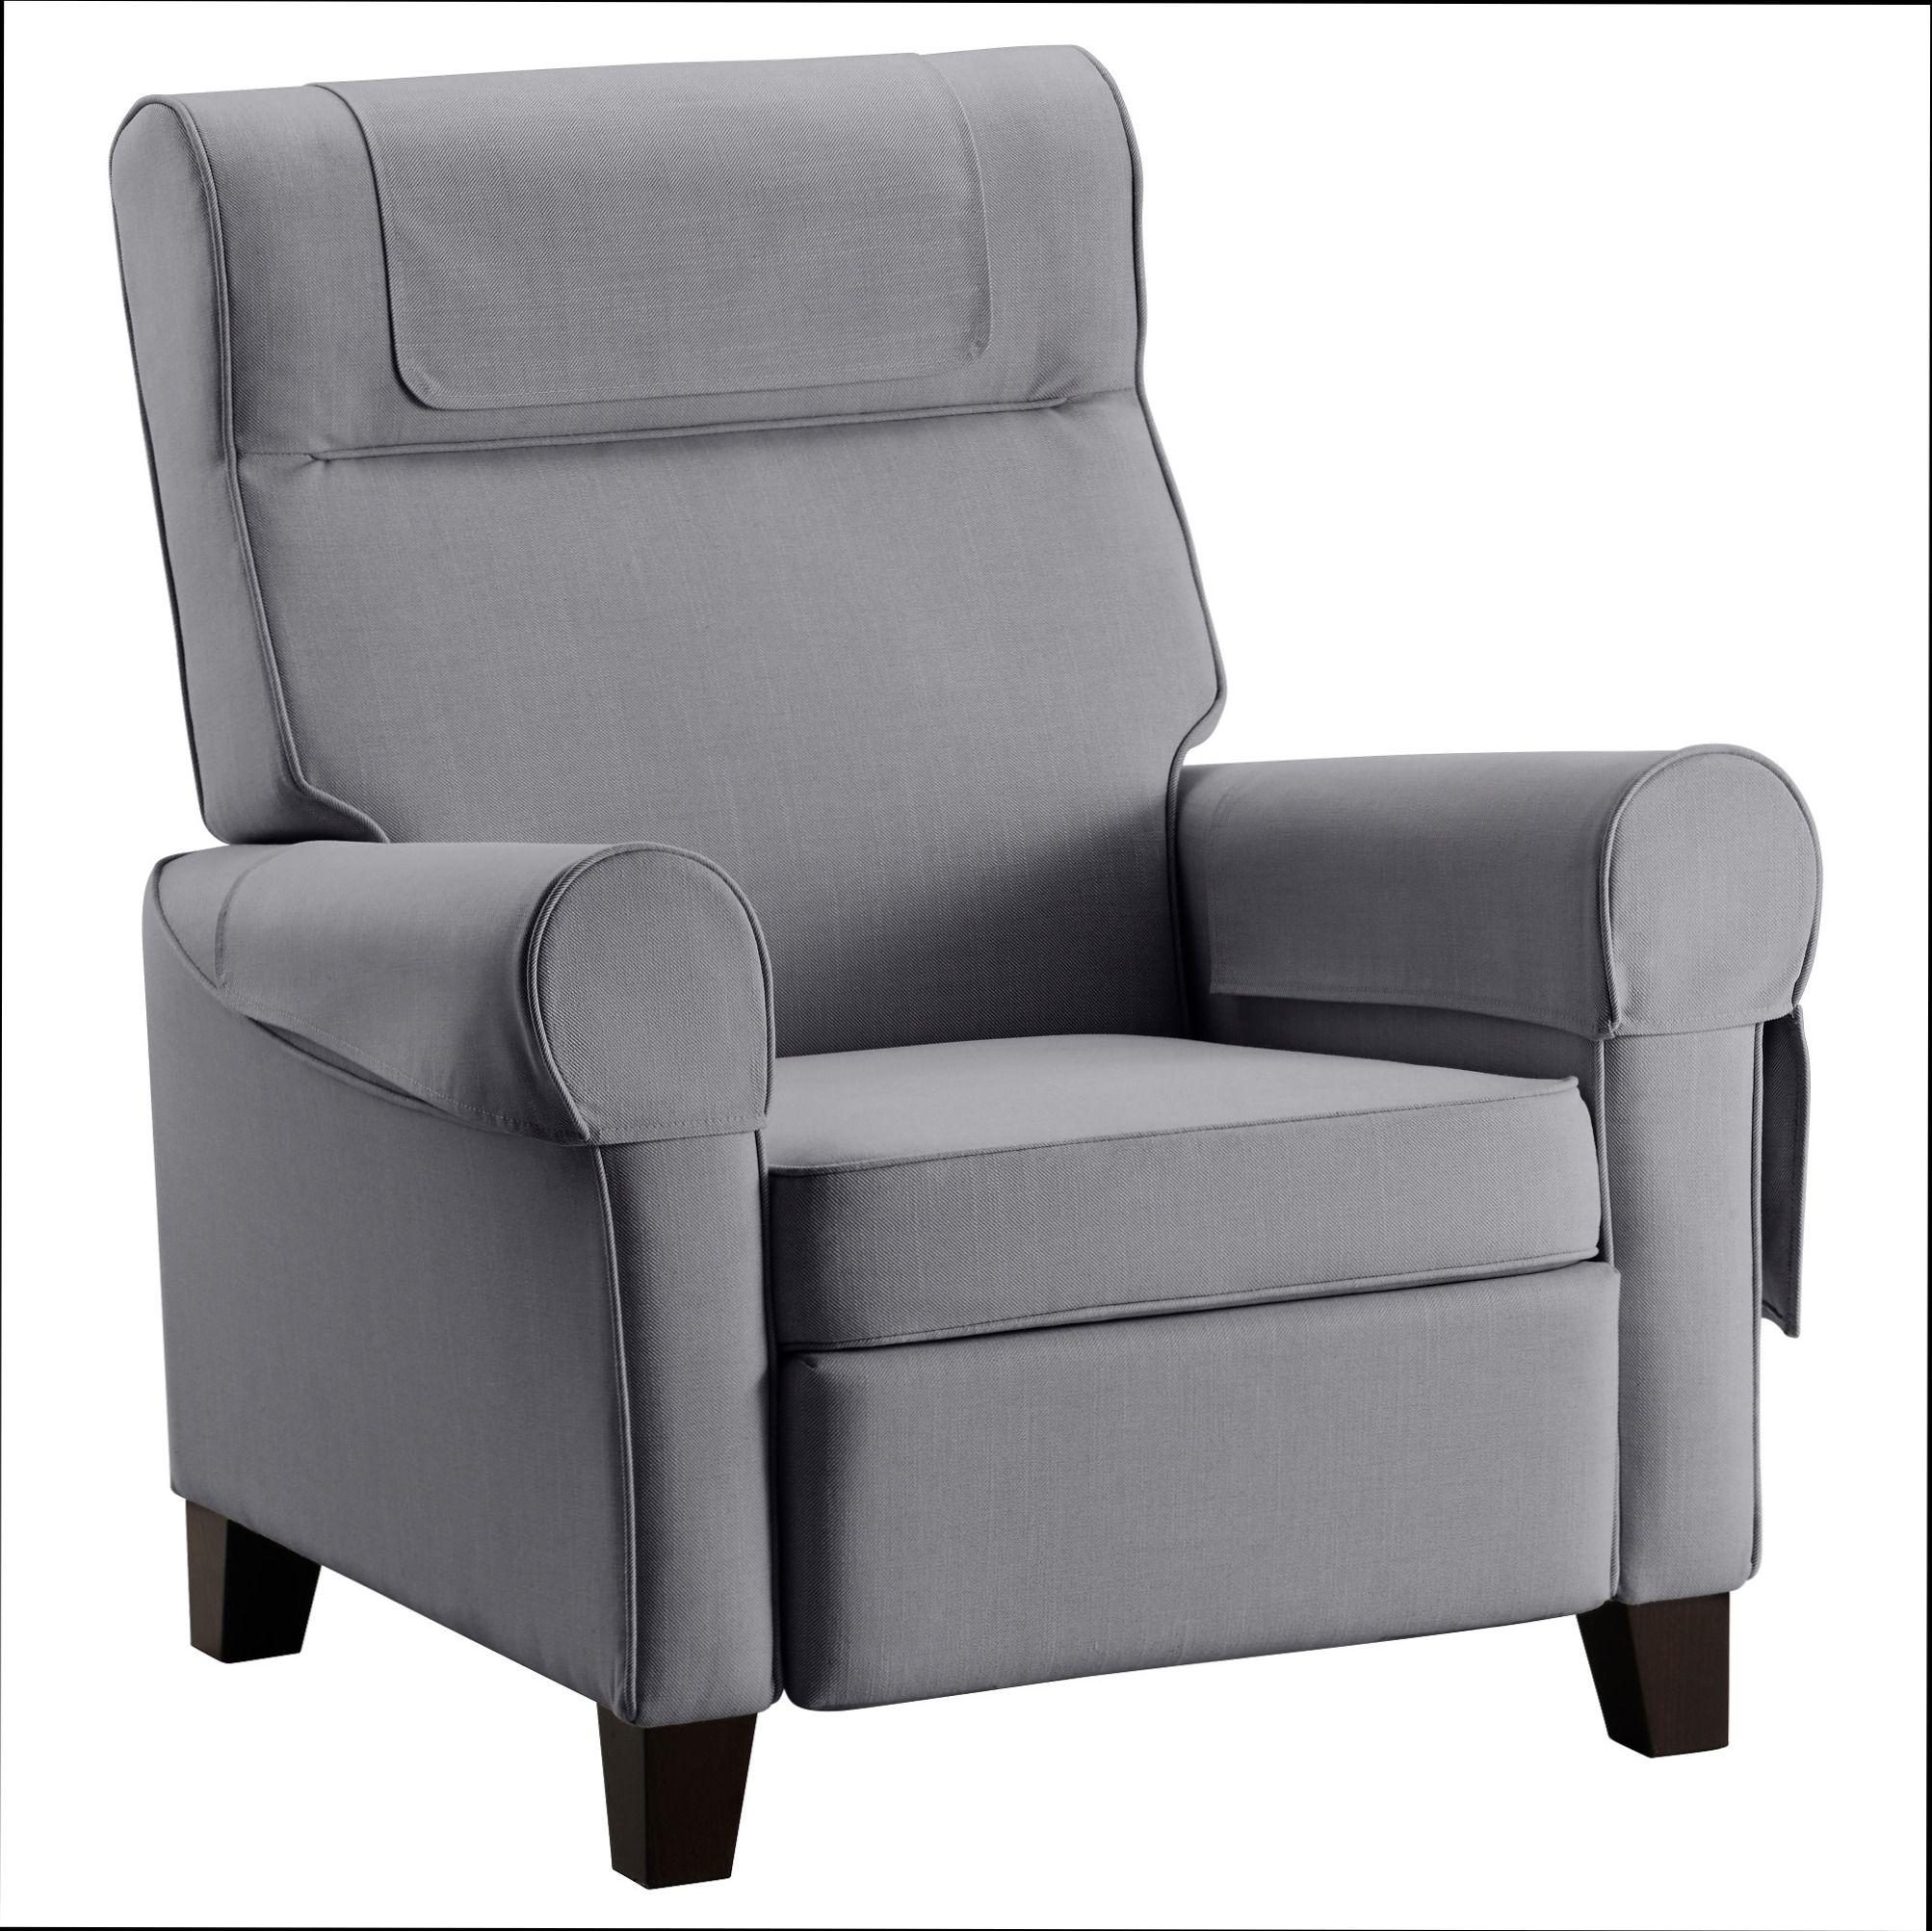 Full Size of Sessel Rosa Ikea Pong Ohne Bezug Ohrensessel Blau Luxus Sofa Mit Schlaffunktion Schlafzimmer Relaxsessel Garten Miniküche Wohnzimmer Küche Kosten Wohnzimmer Sessel Rosa Ikea